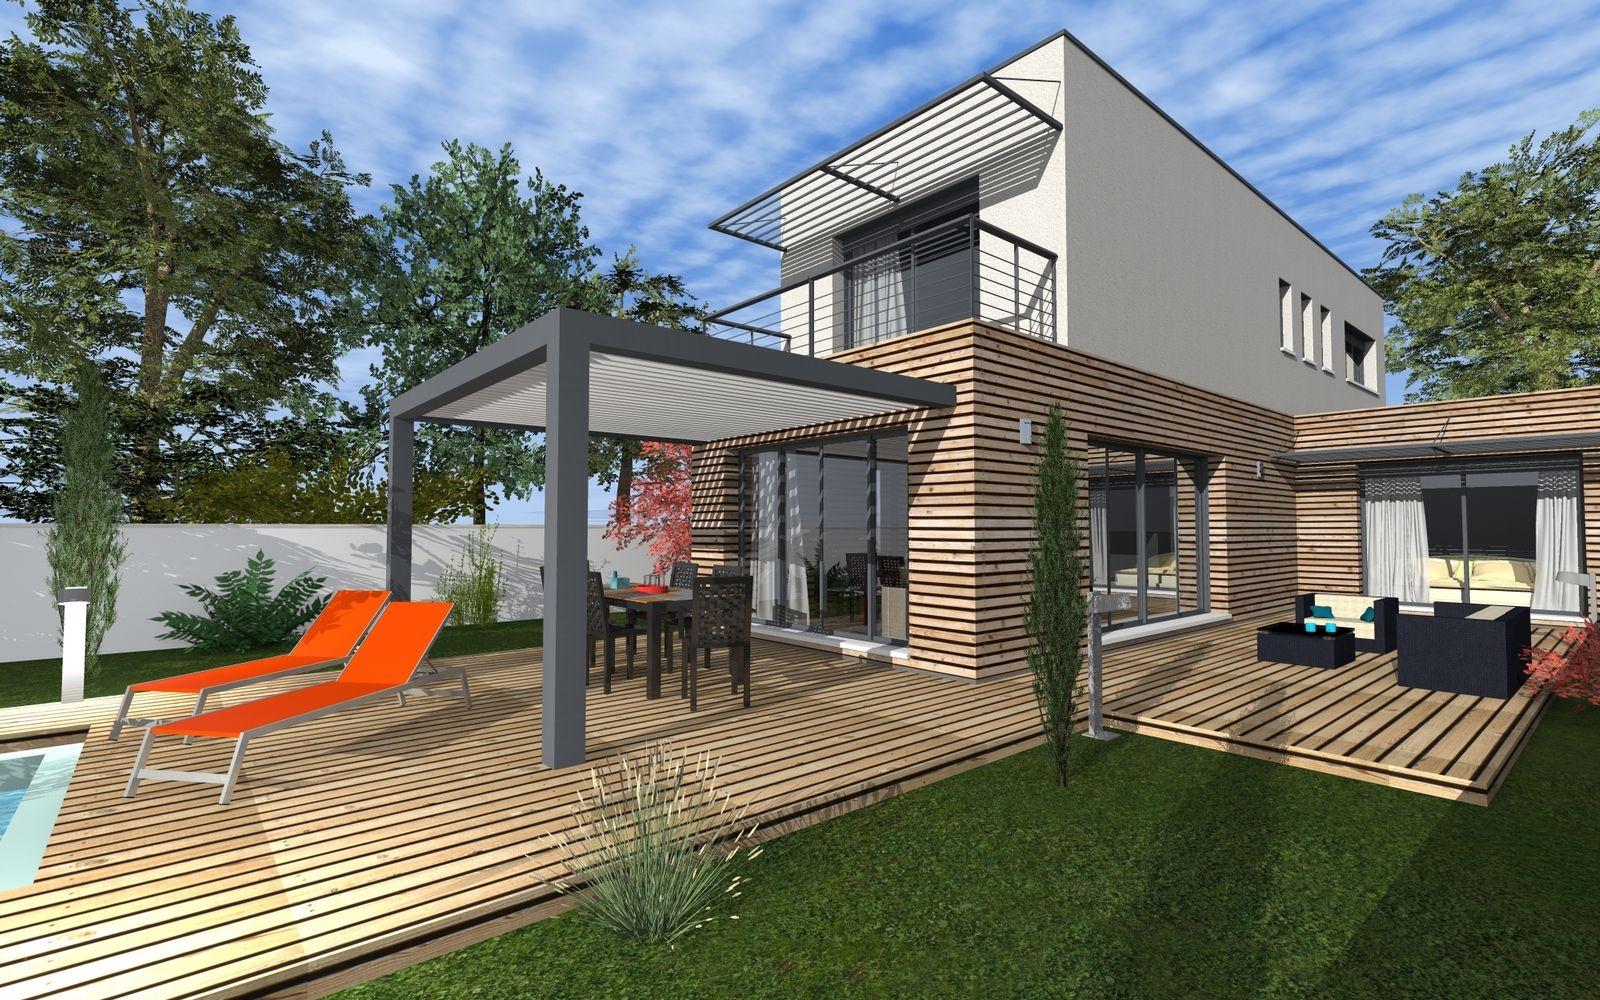 Maison moderne bardage bois et toit terrasse   Container Home ...